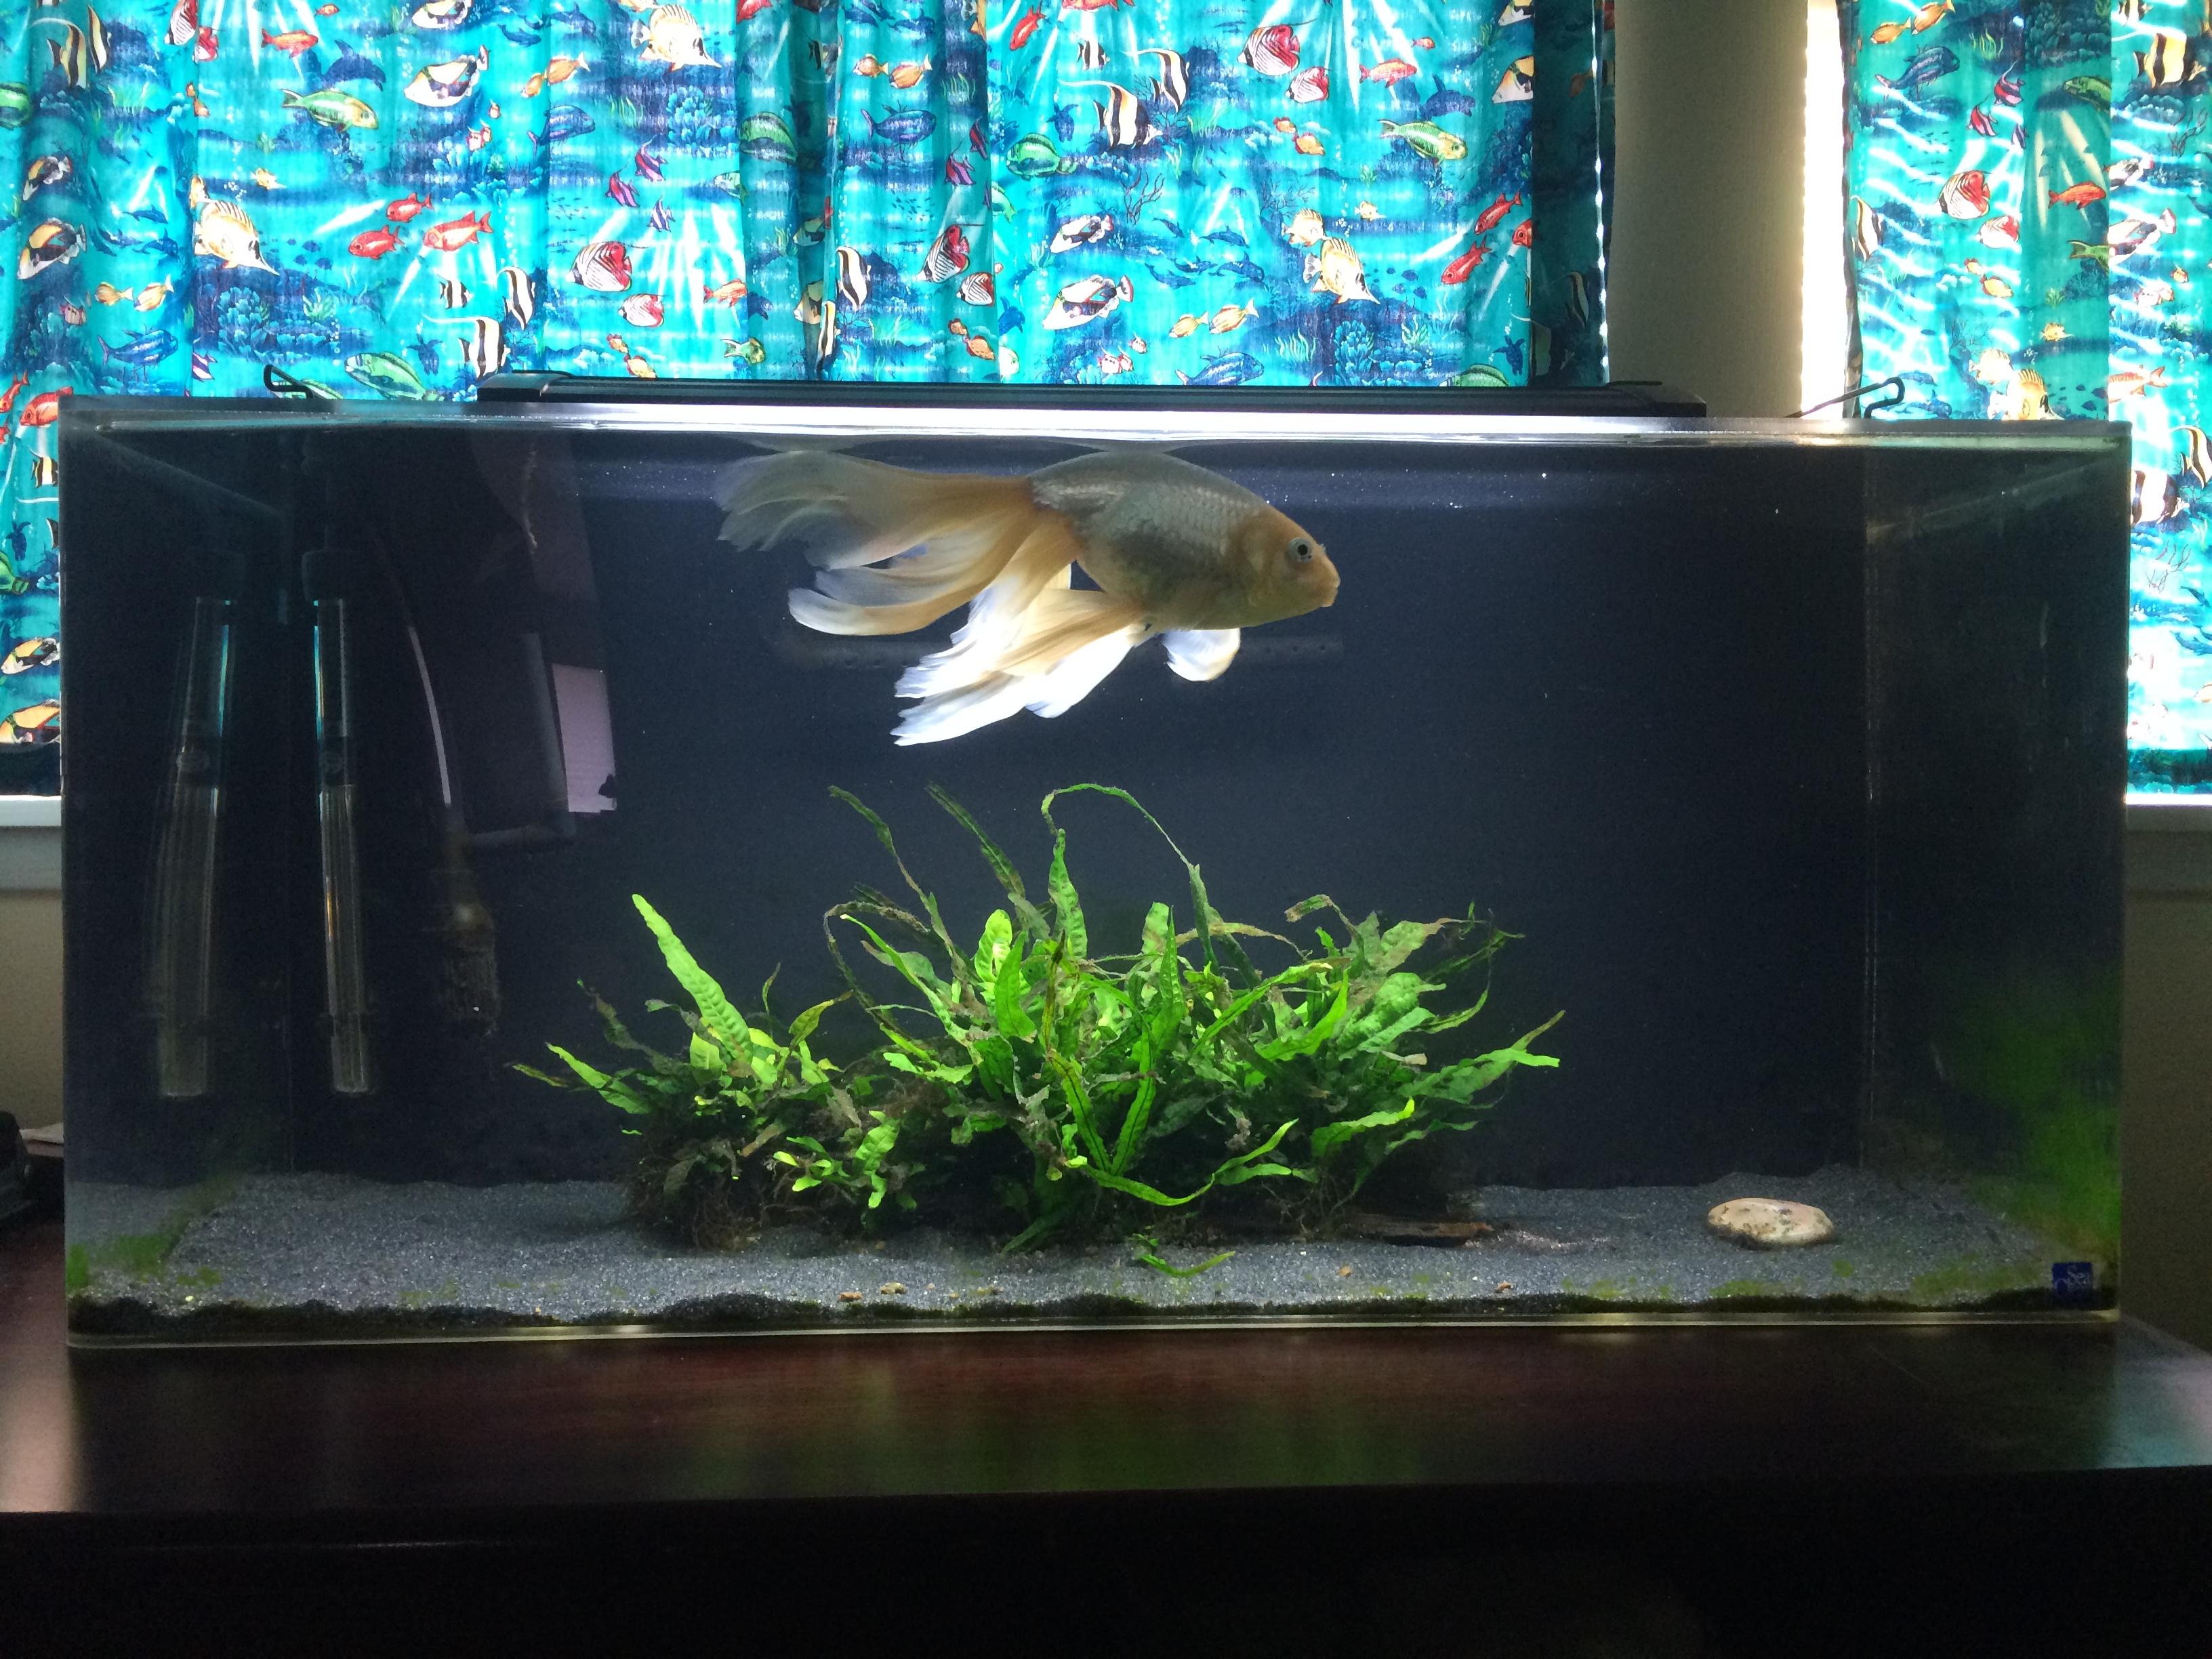 Fish tank mutualistic symbiosis for Two gallon fish tank